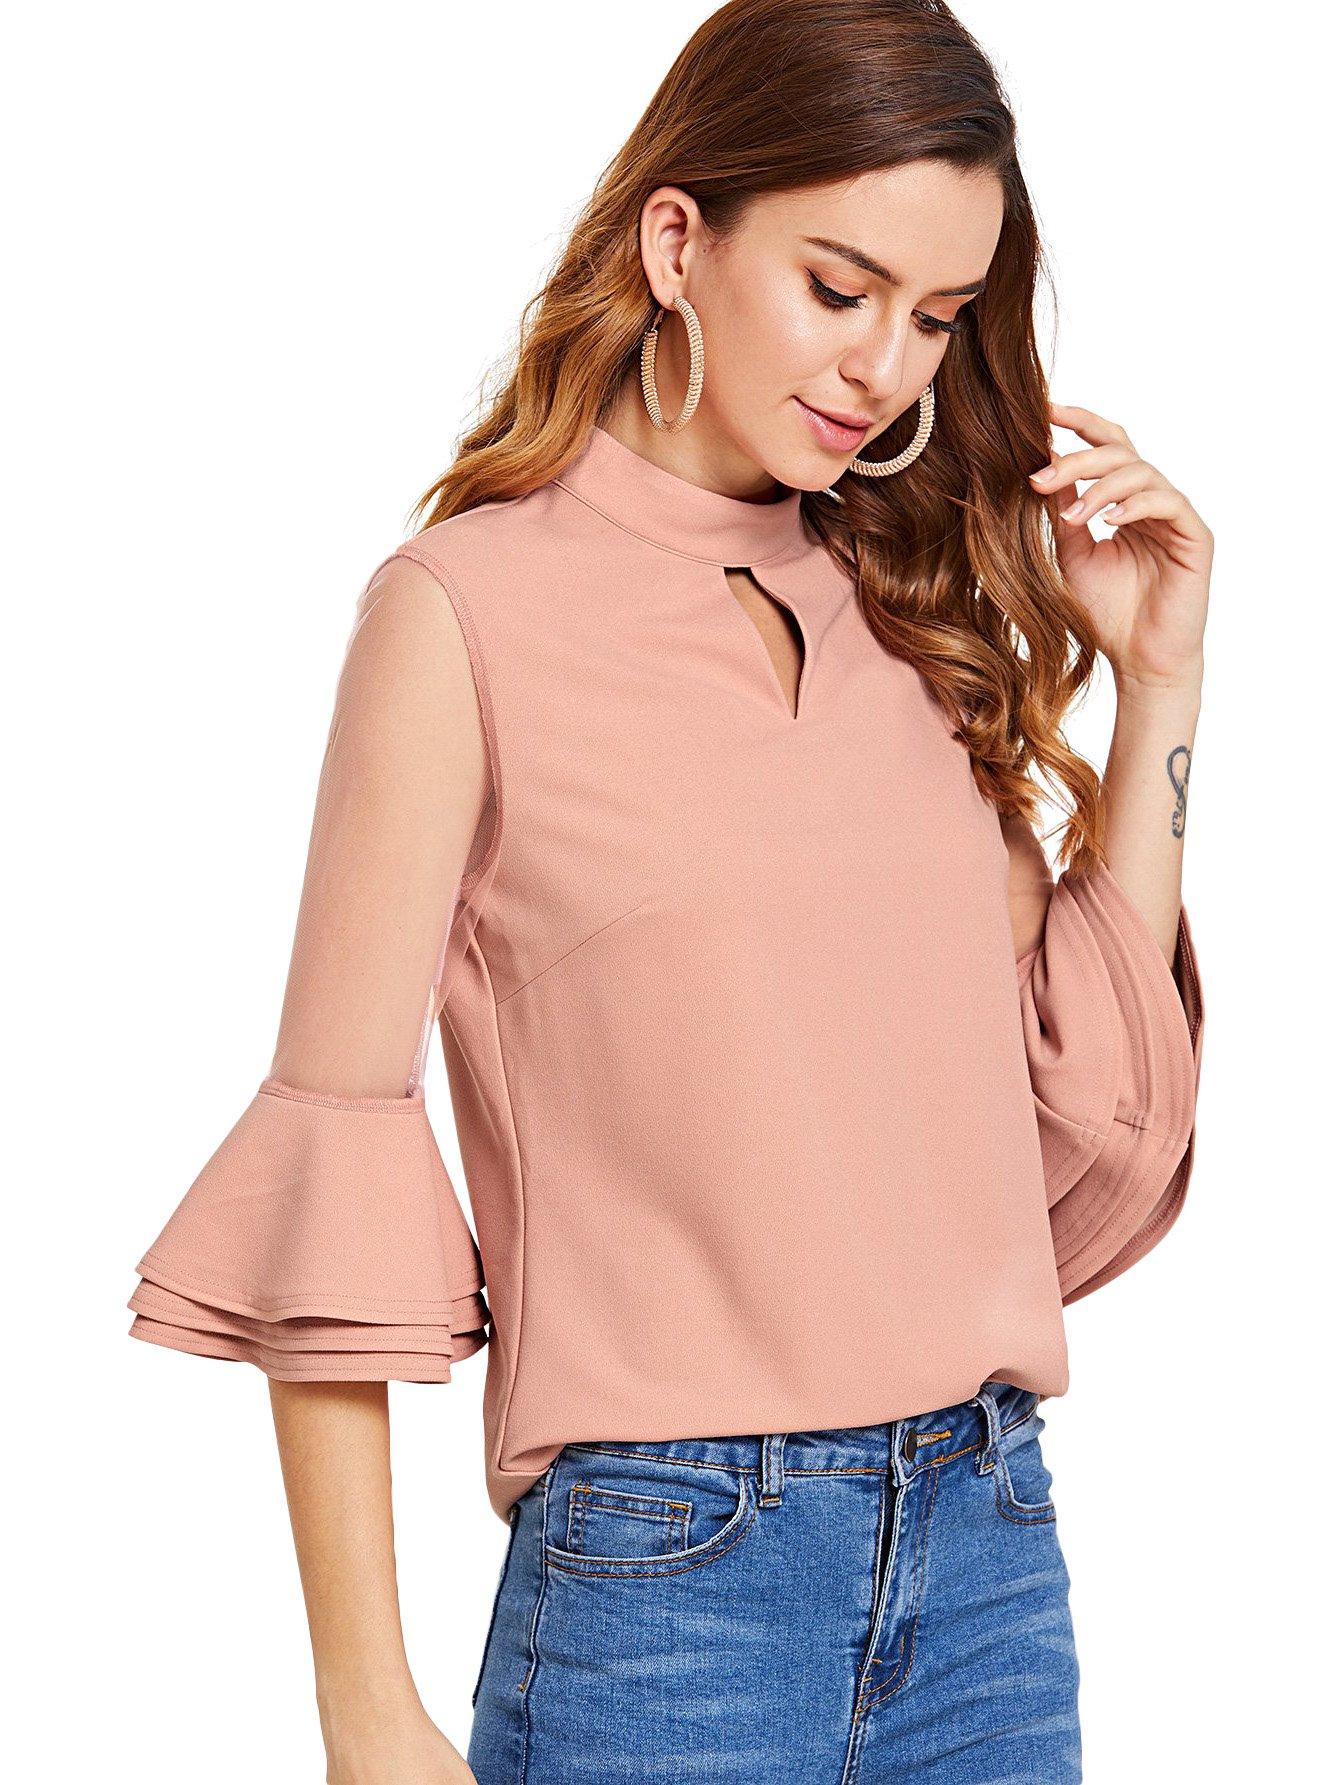 Milumia Women's Mesh Insert Layered Ruffle Sleeve Blouse 3/4 Short Sleeve Plain Casual Blouse Top Pink S